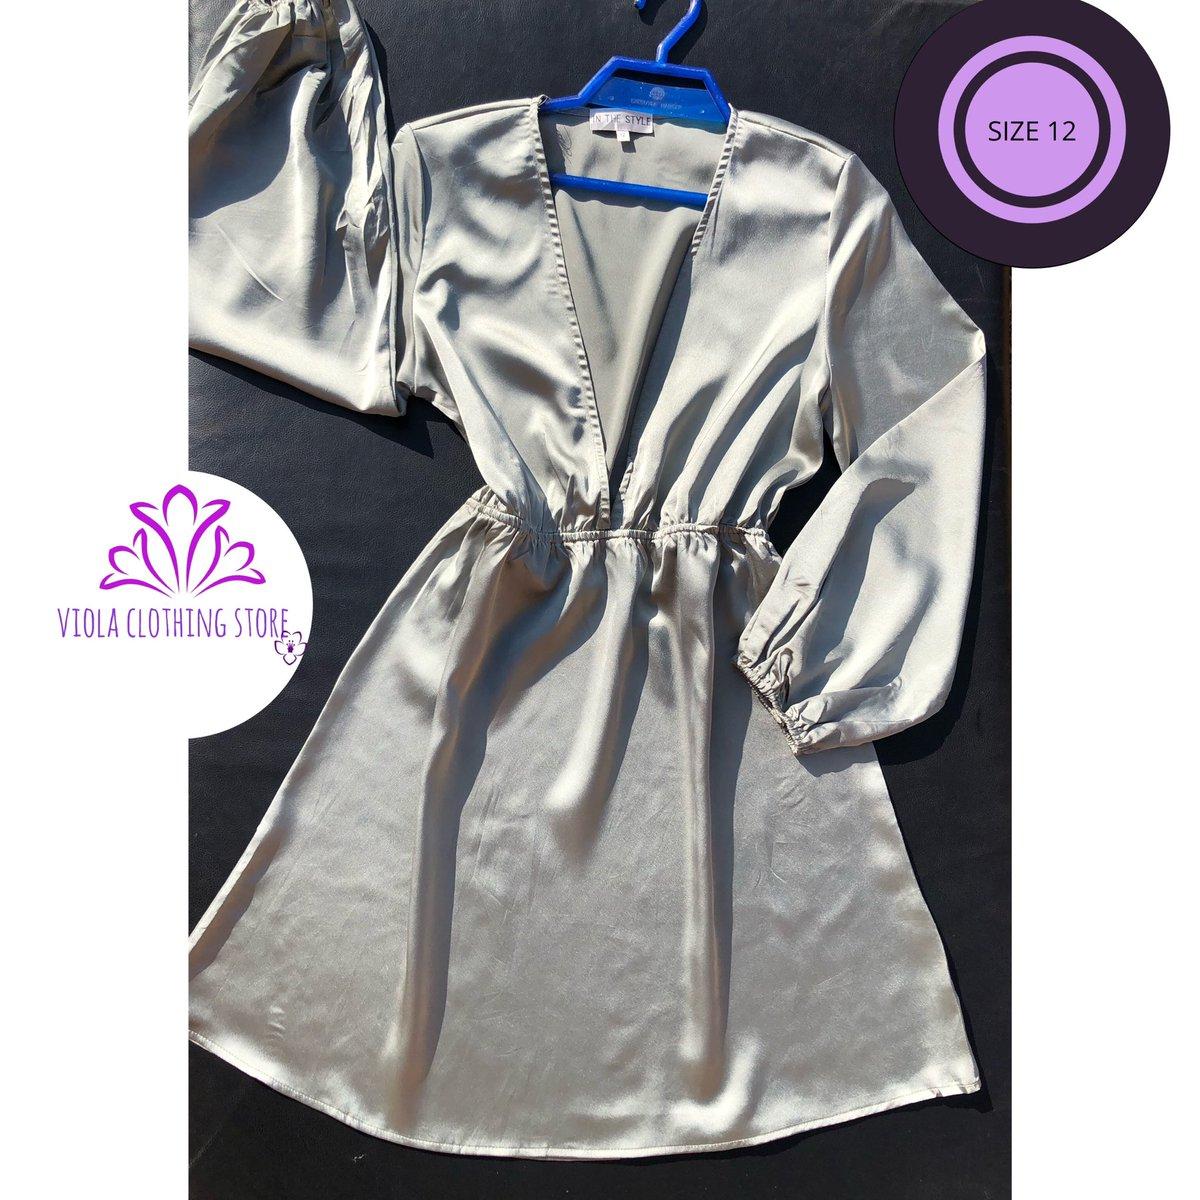 .Please like and retweet🙏🏾 .📌Thrifted  . 📌Beautiful khaki satin plunge dress .📌zipper .📌price: 3500 .📌size: 12 #AbujaTwitterCommunity #Nigeria #violaclothingstore #Abuja #ValentinesDay2020 #dress #lagos #thriftstore https://t.co/i8HvPWC3z0